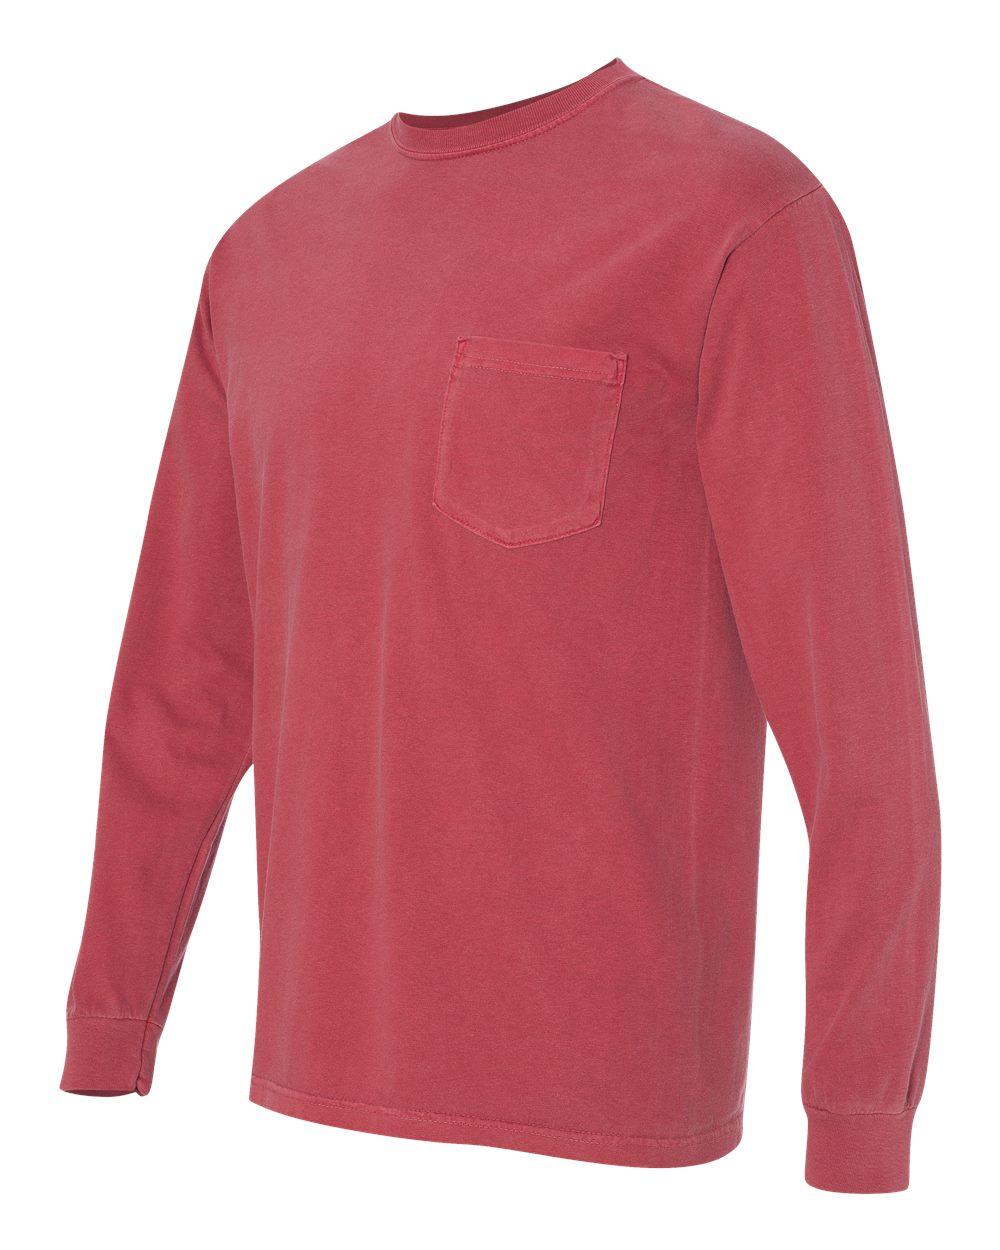 Comfort-Colors-Men-039-s-6-1-oz-Long-Sleeve-Pocket-T-Shirt-C4410-S-3XL thumbnail 11